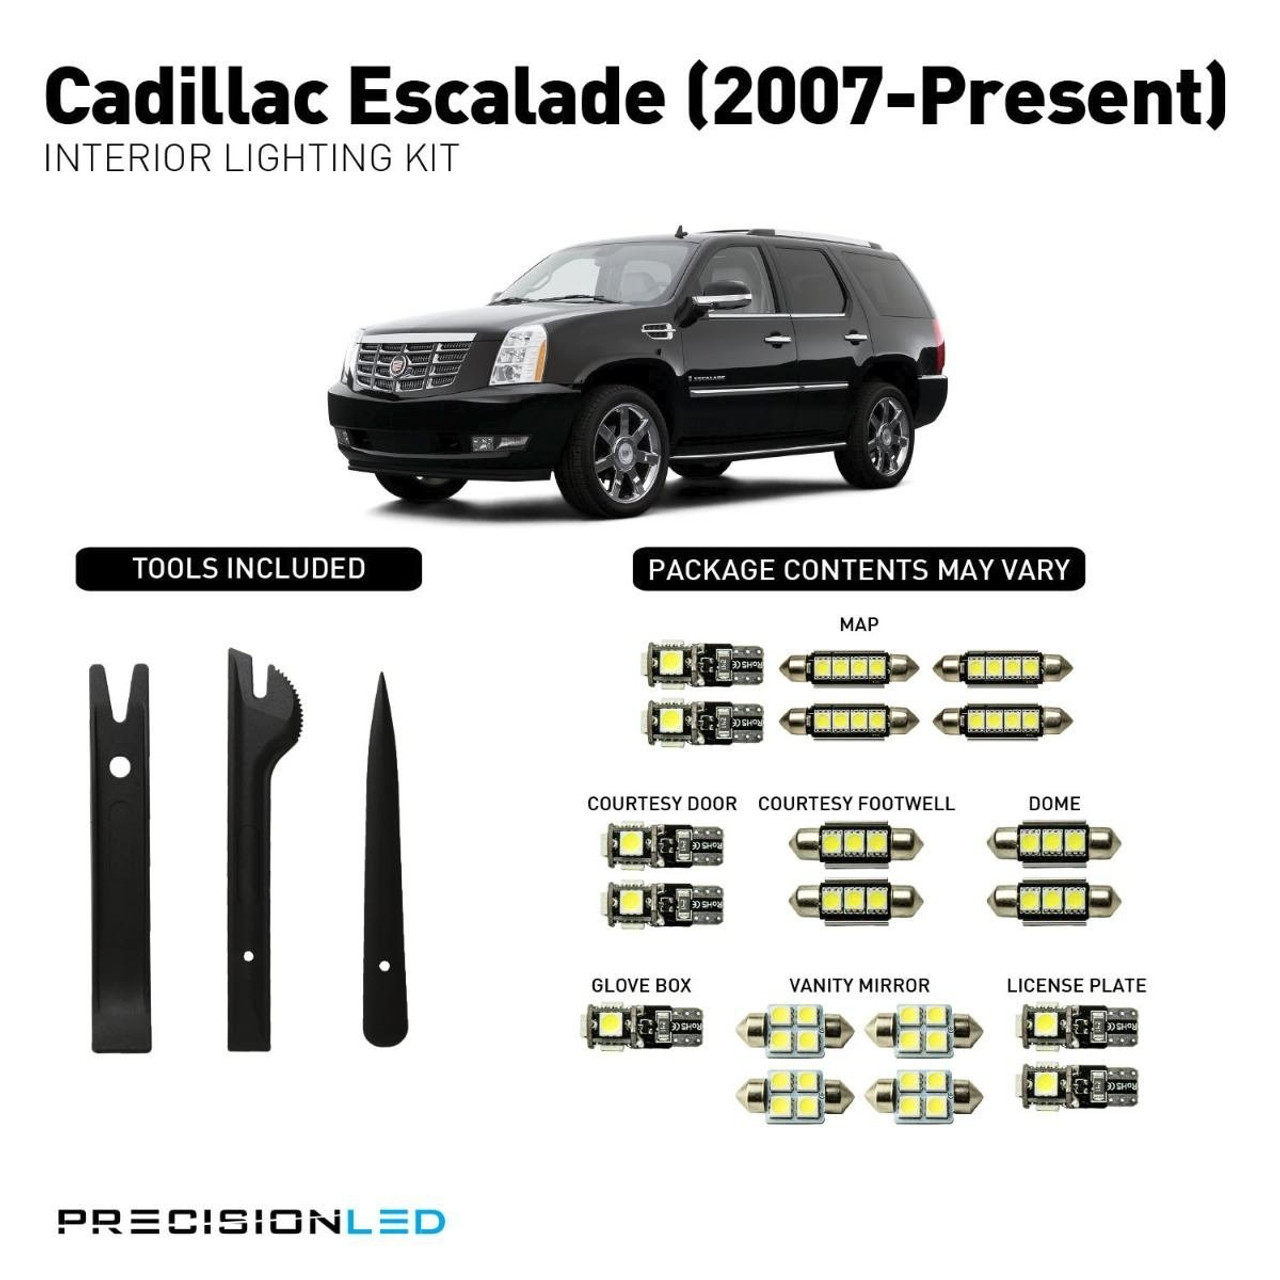 Cadillac Escalade LED Interior Package (2007-Present)